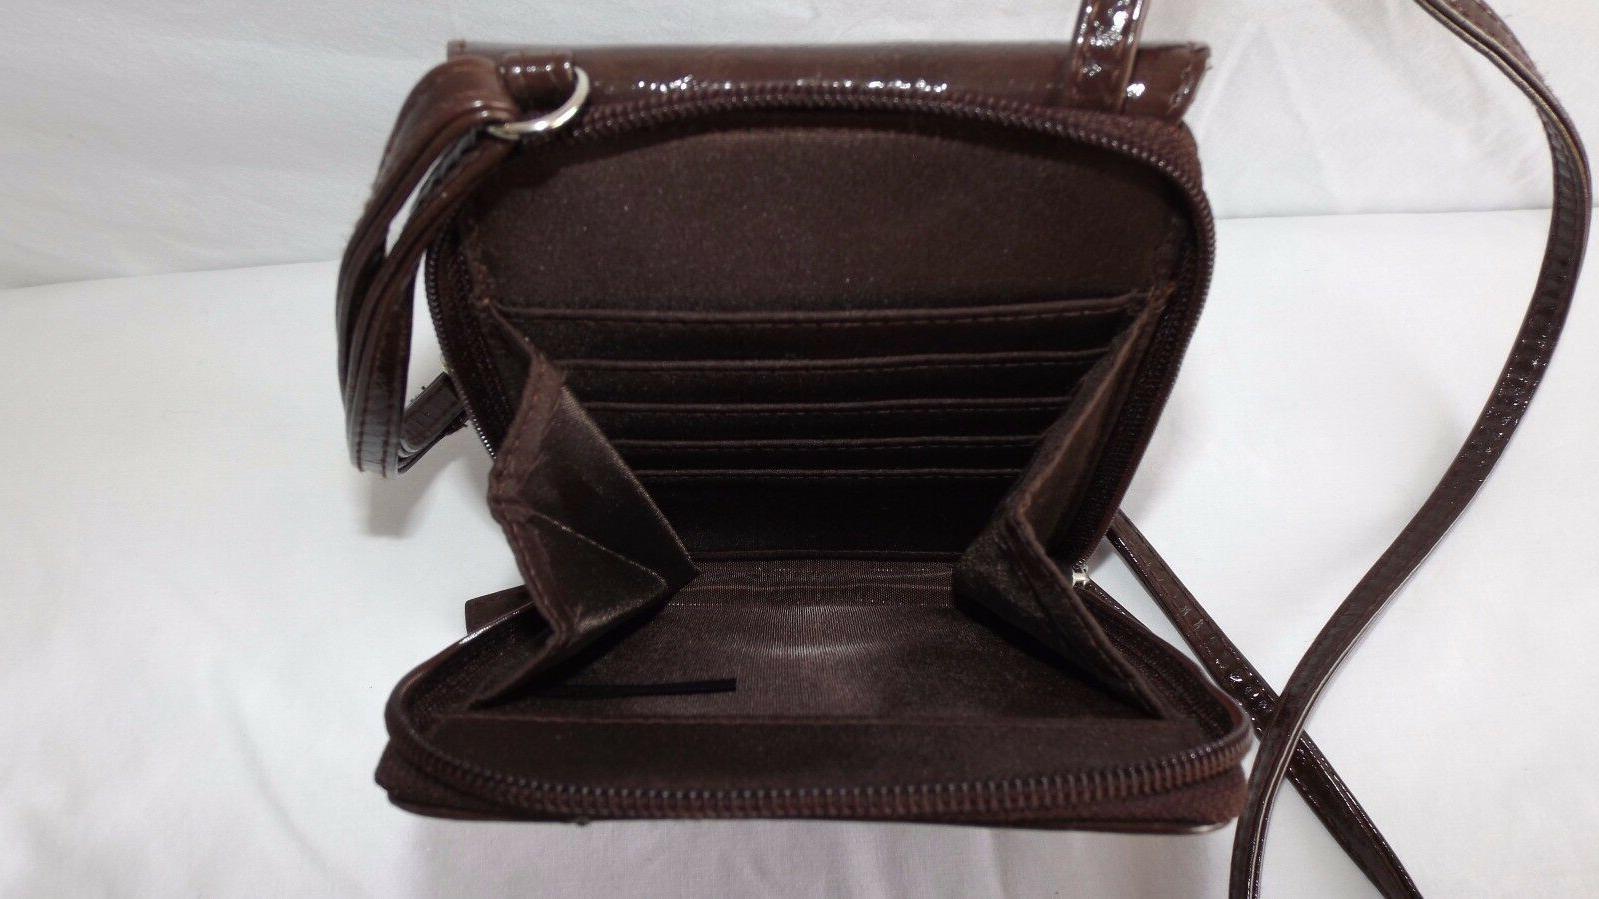 Mundi Body Bag, Patent Leather, NWOTS